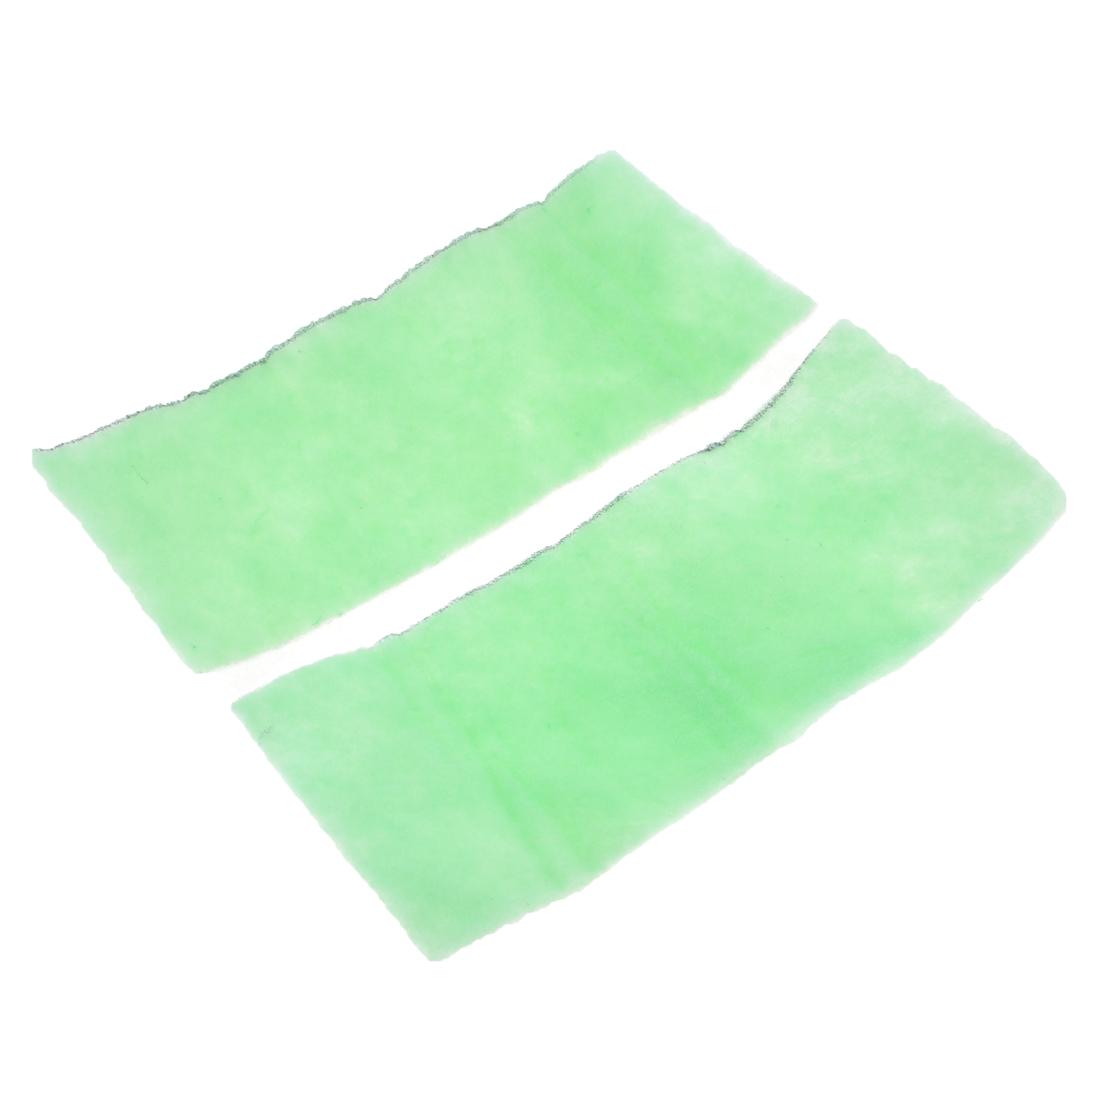 "2 Pcs 11.4"" Long Biochemical Filter Sponge for Fish Tank Green White"